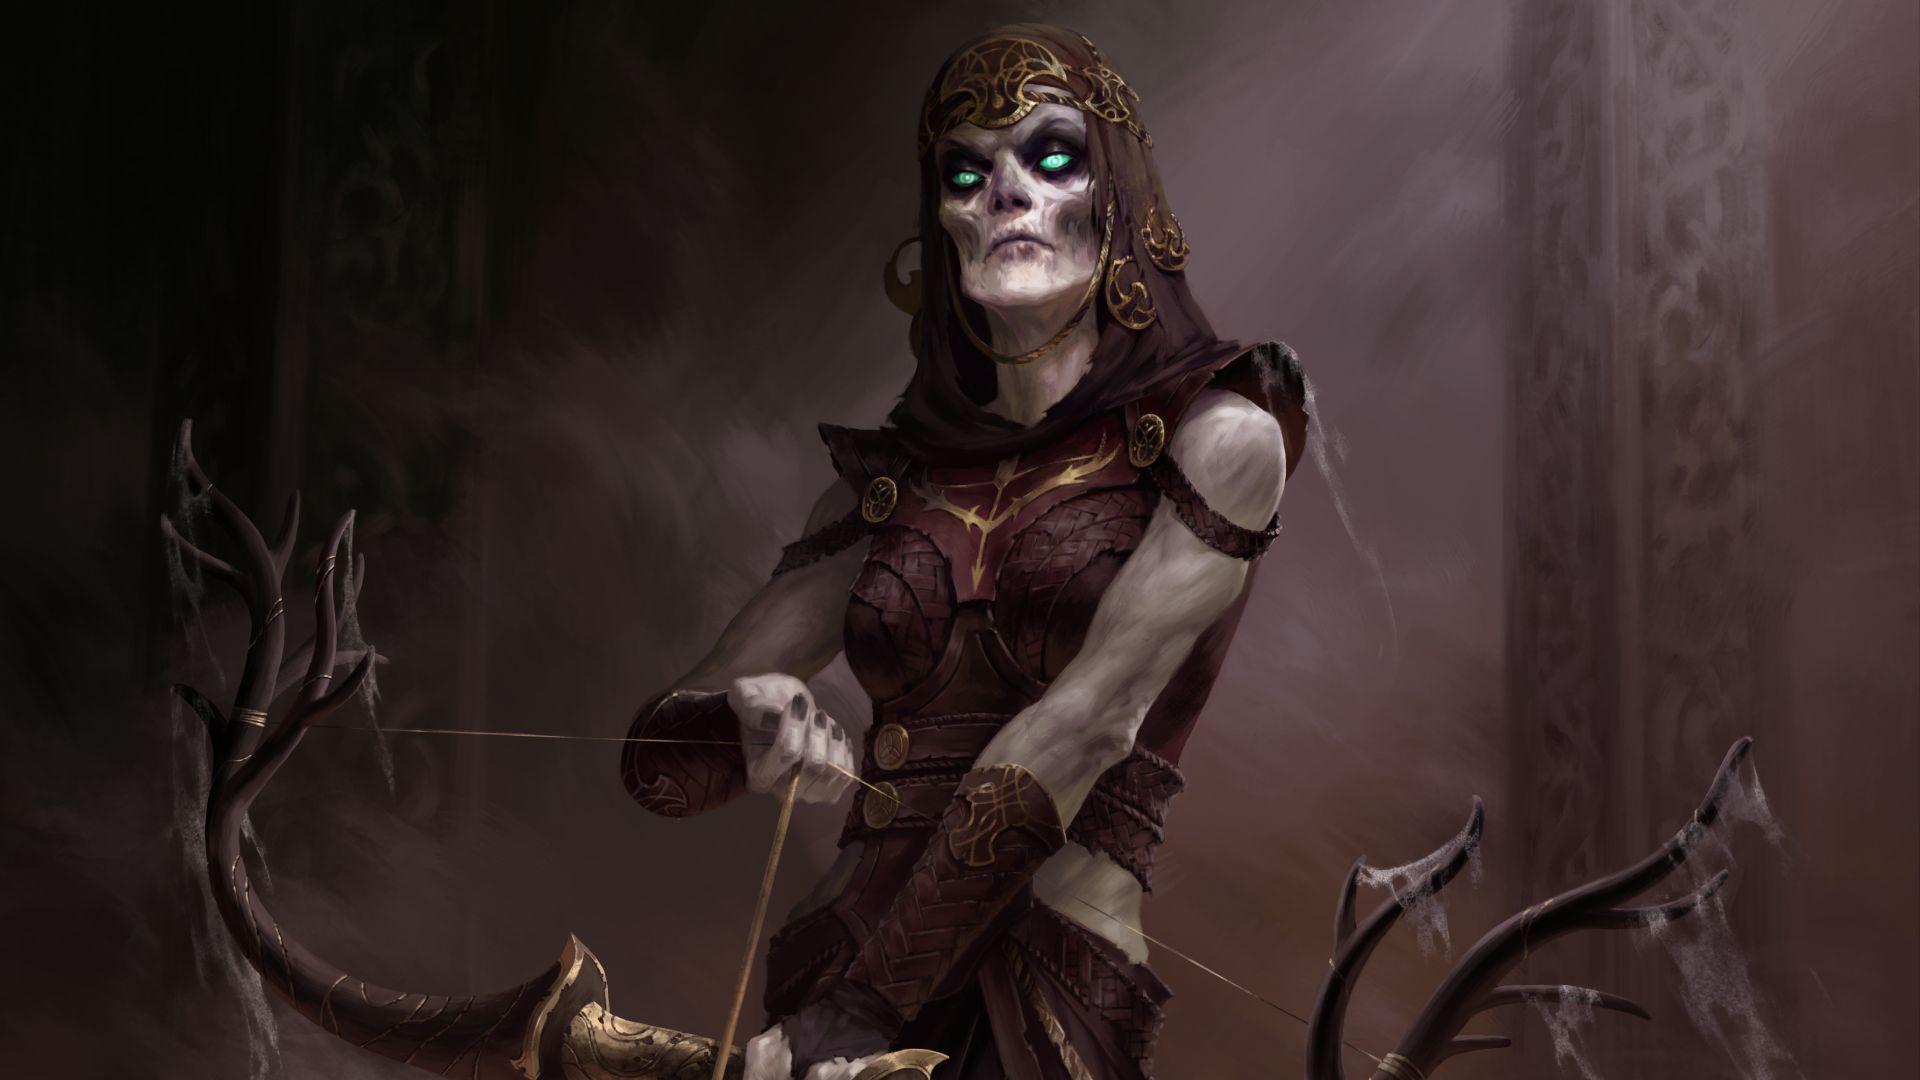 An undead archer